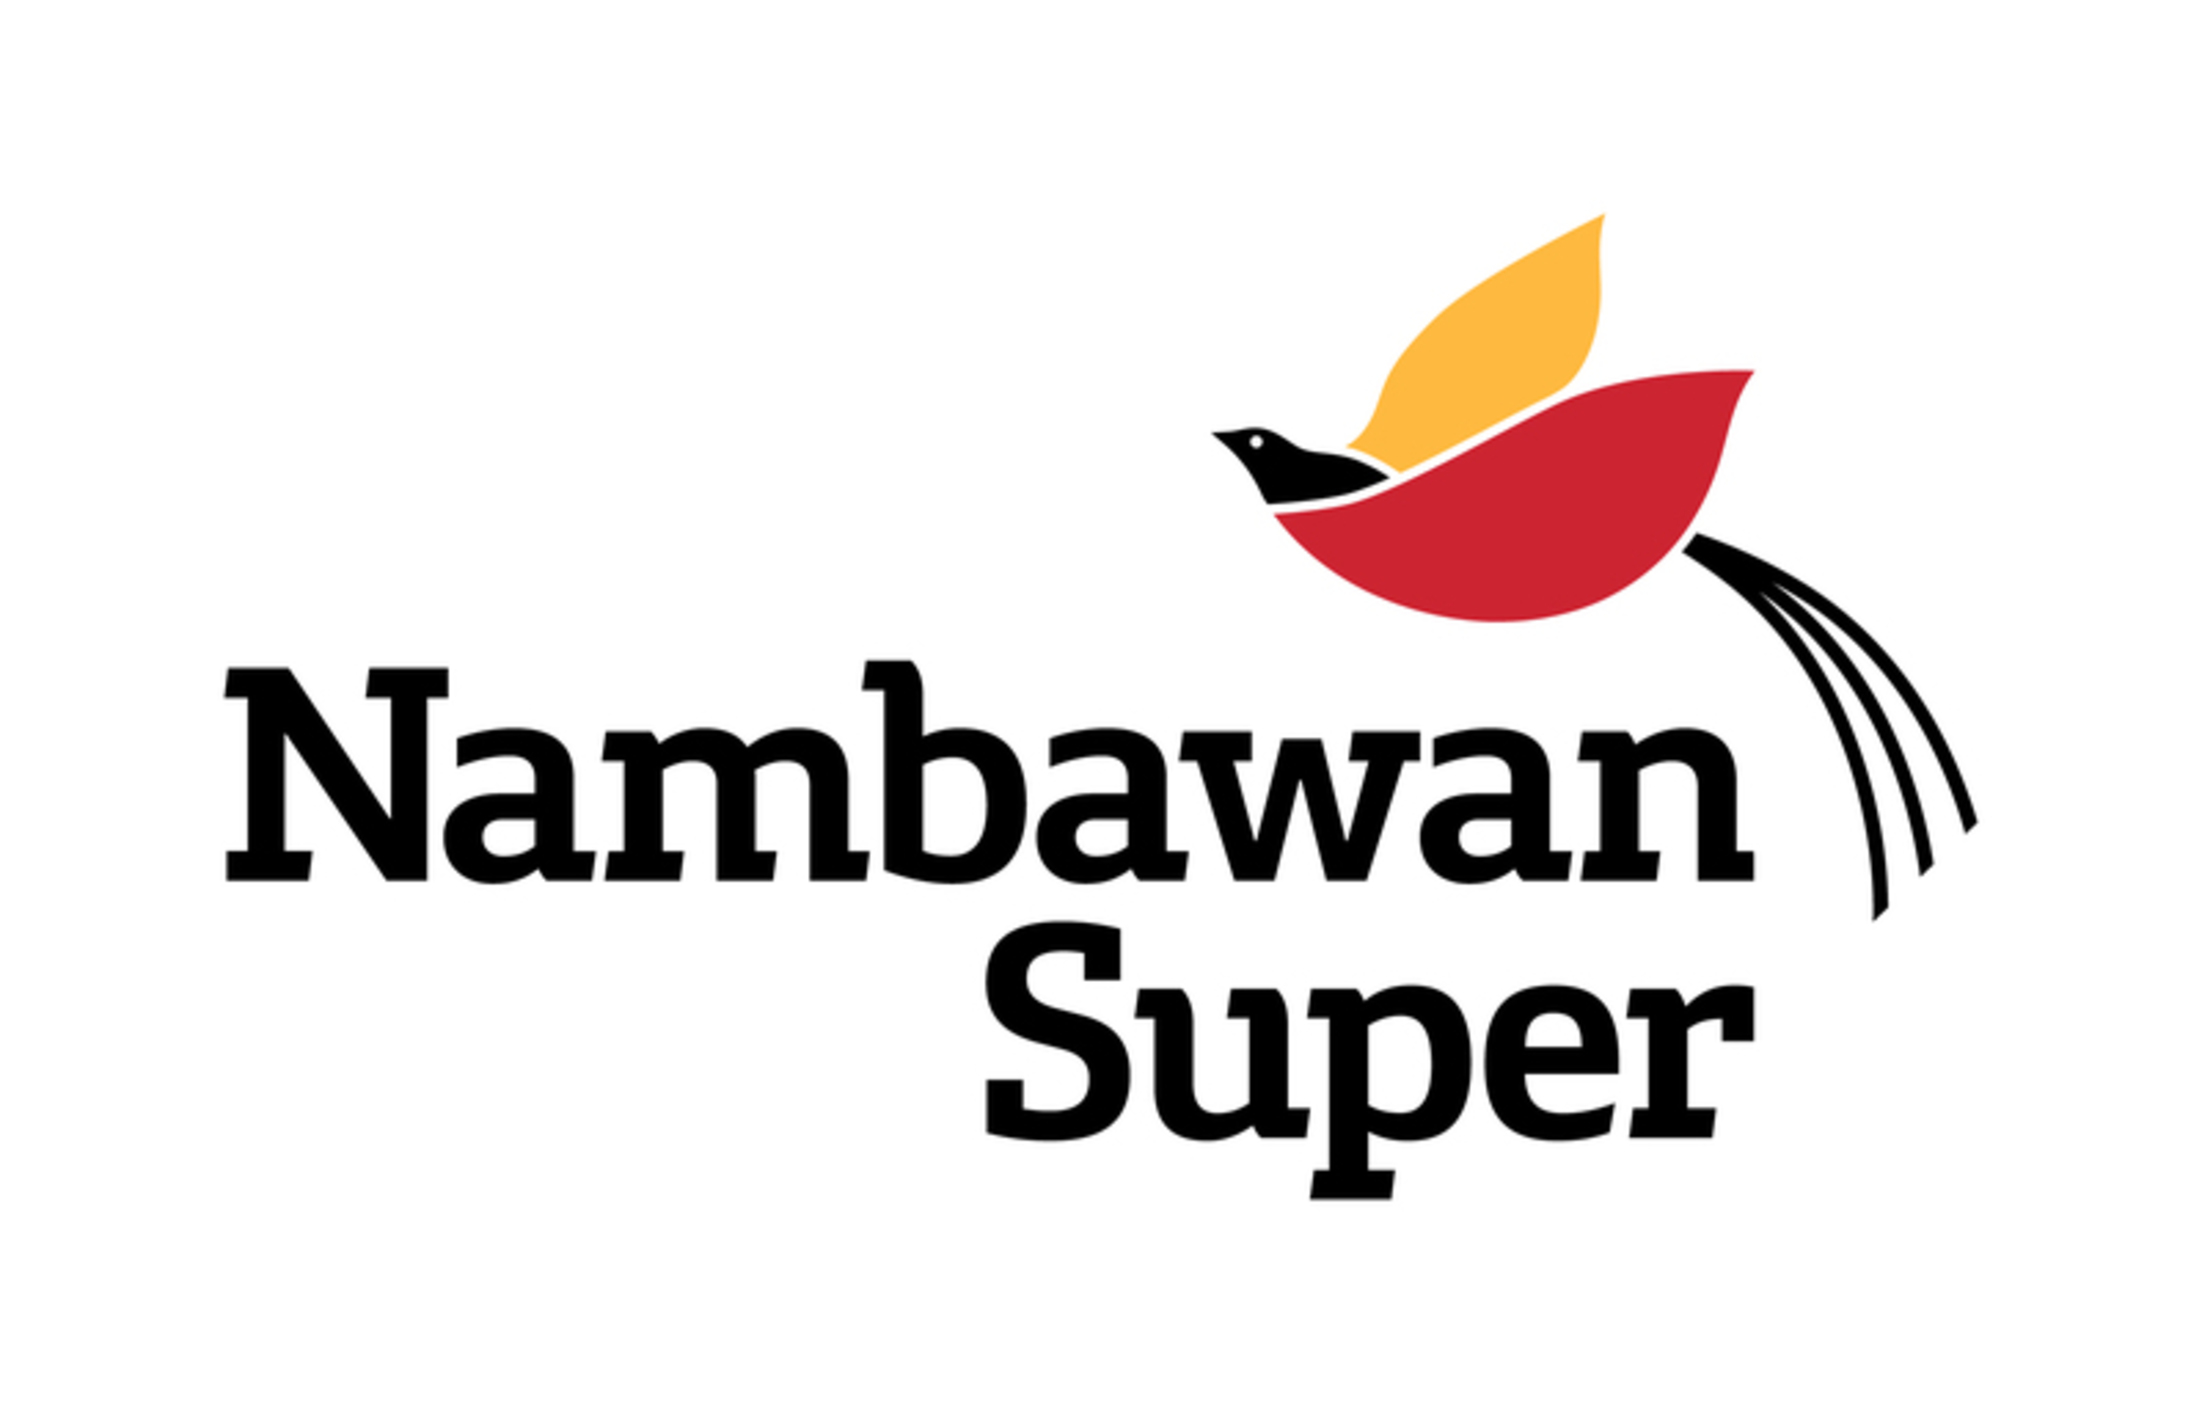 Nambawan Super Ltd